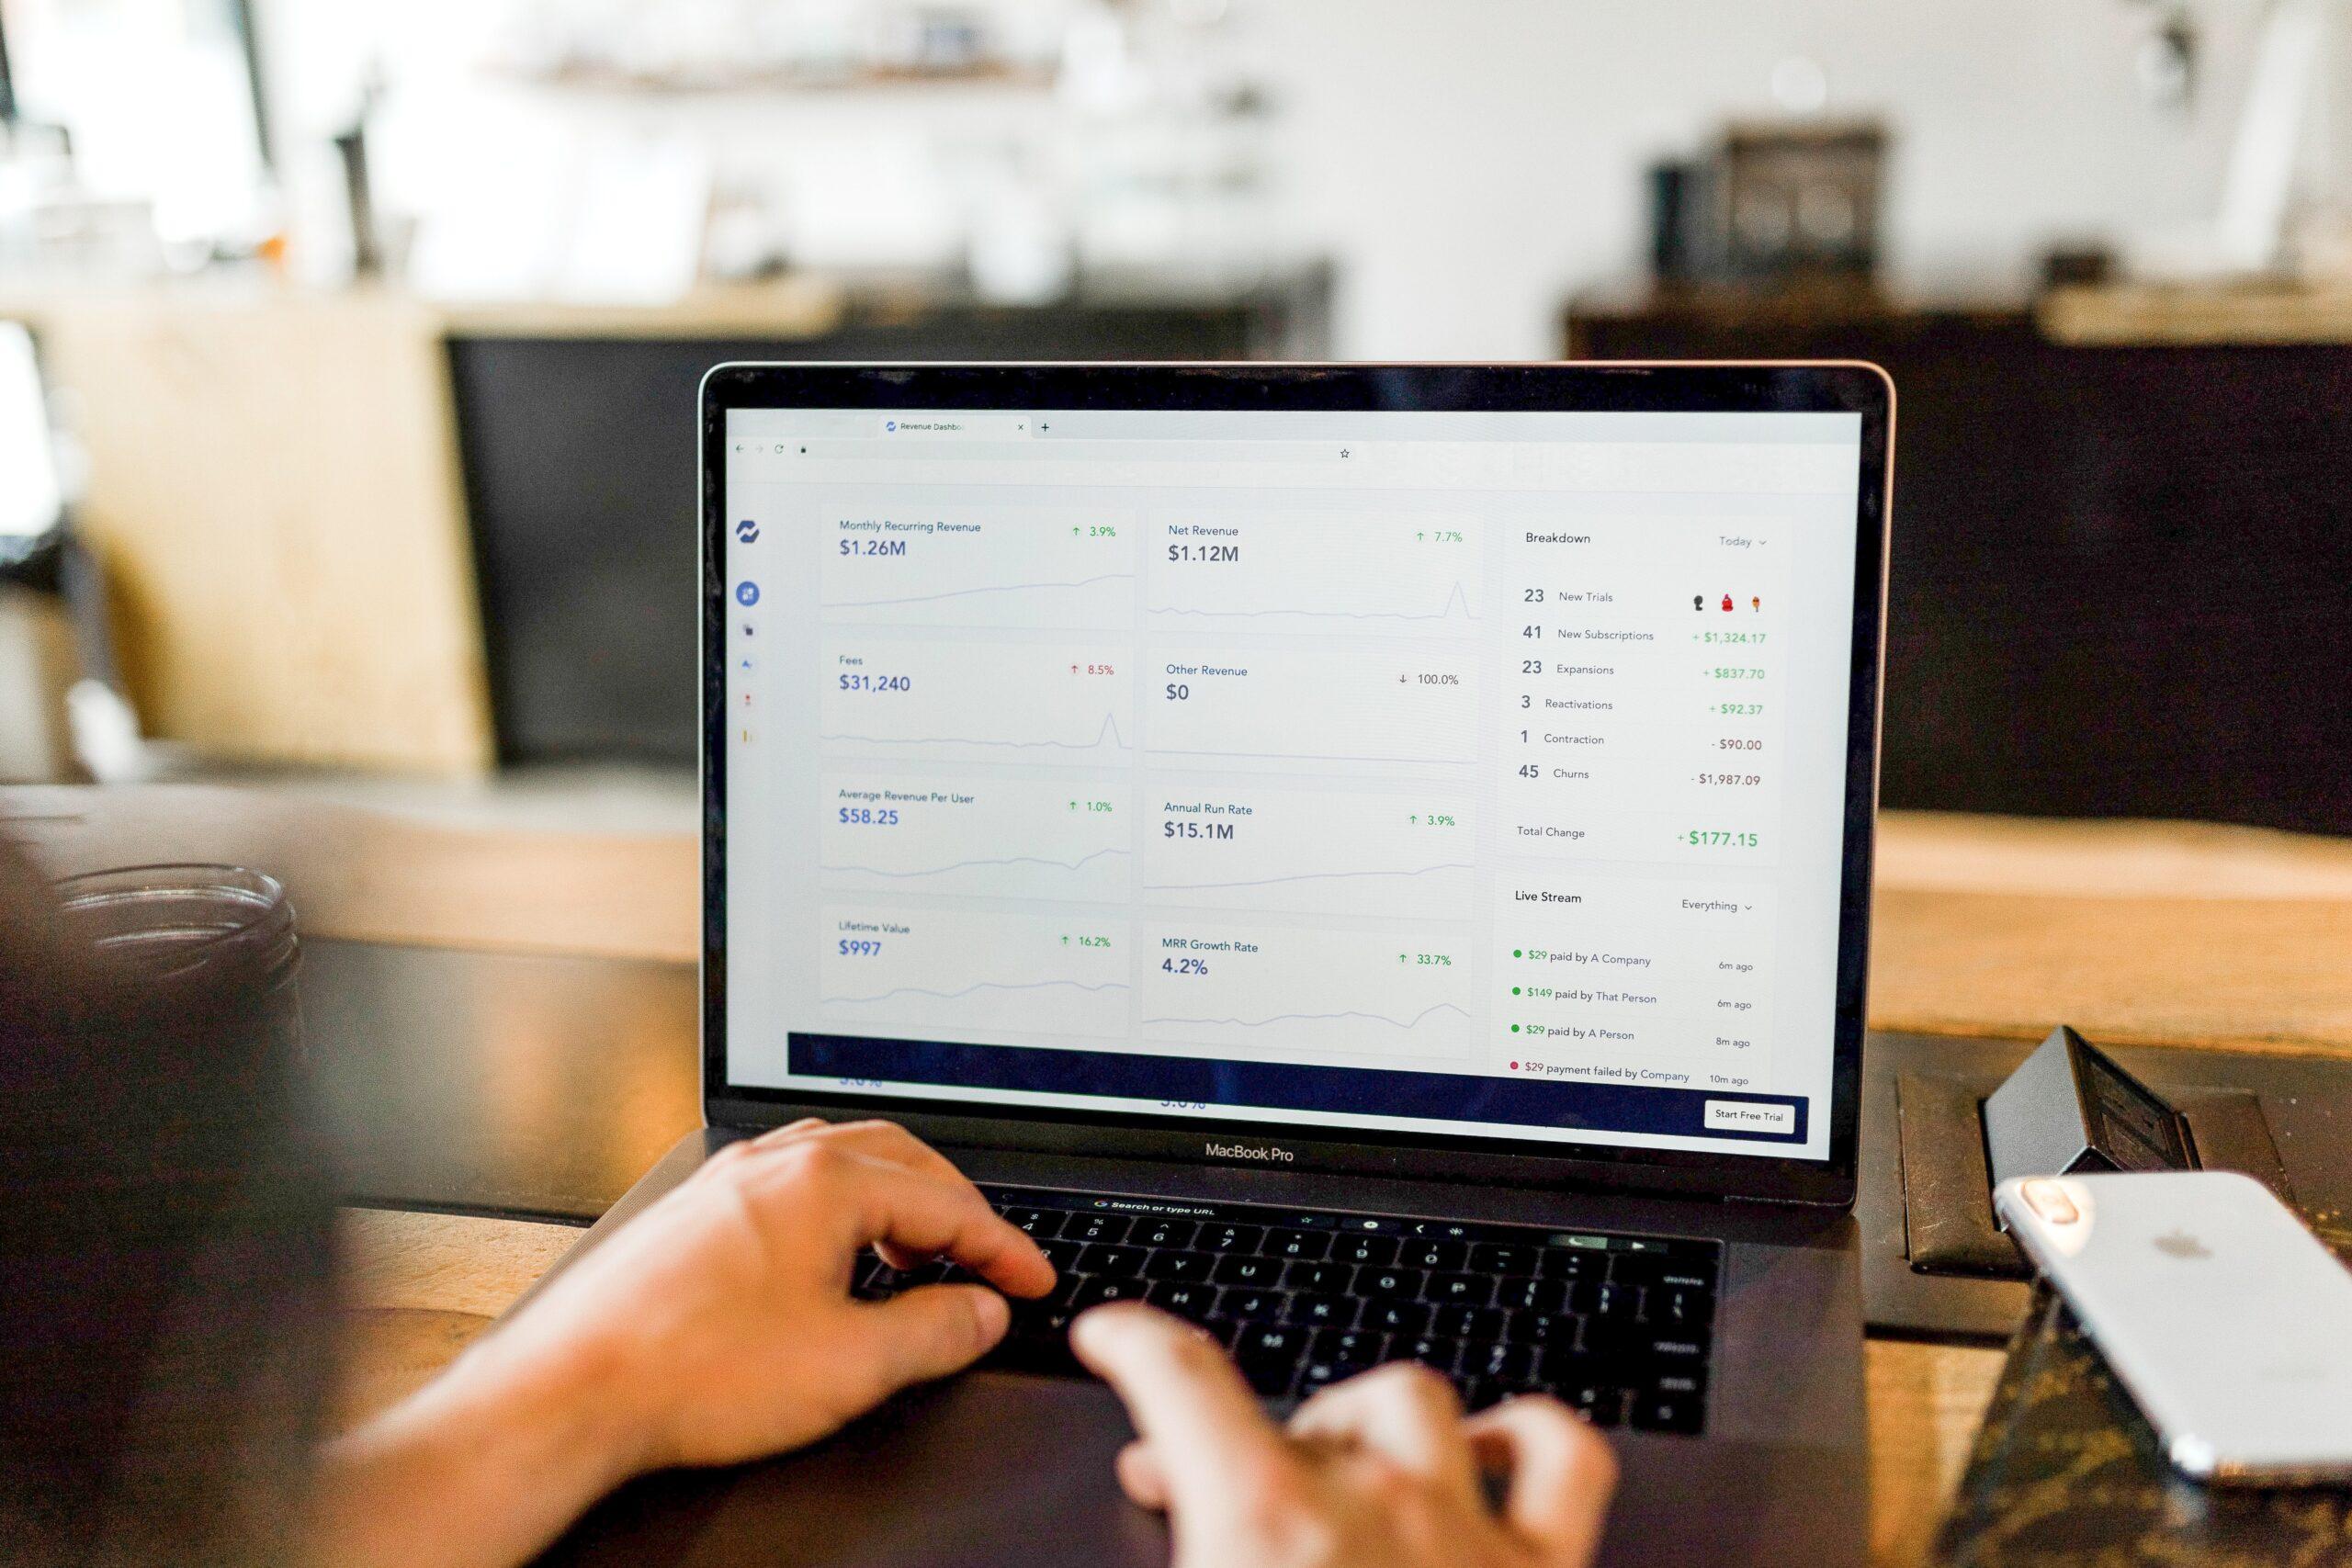 website-analytics-business-revenue-digital-marketing-trends